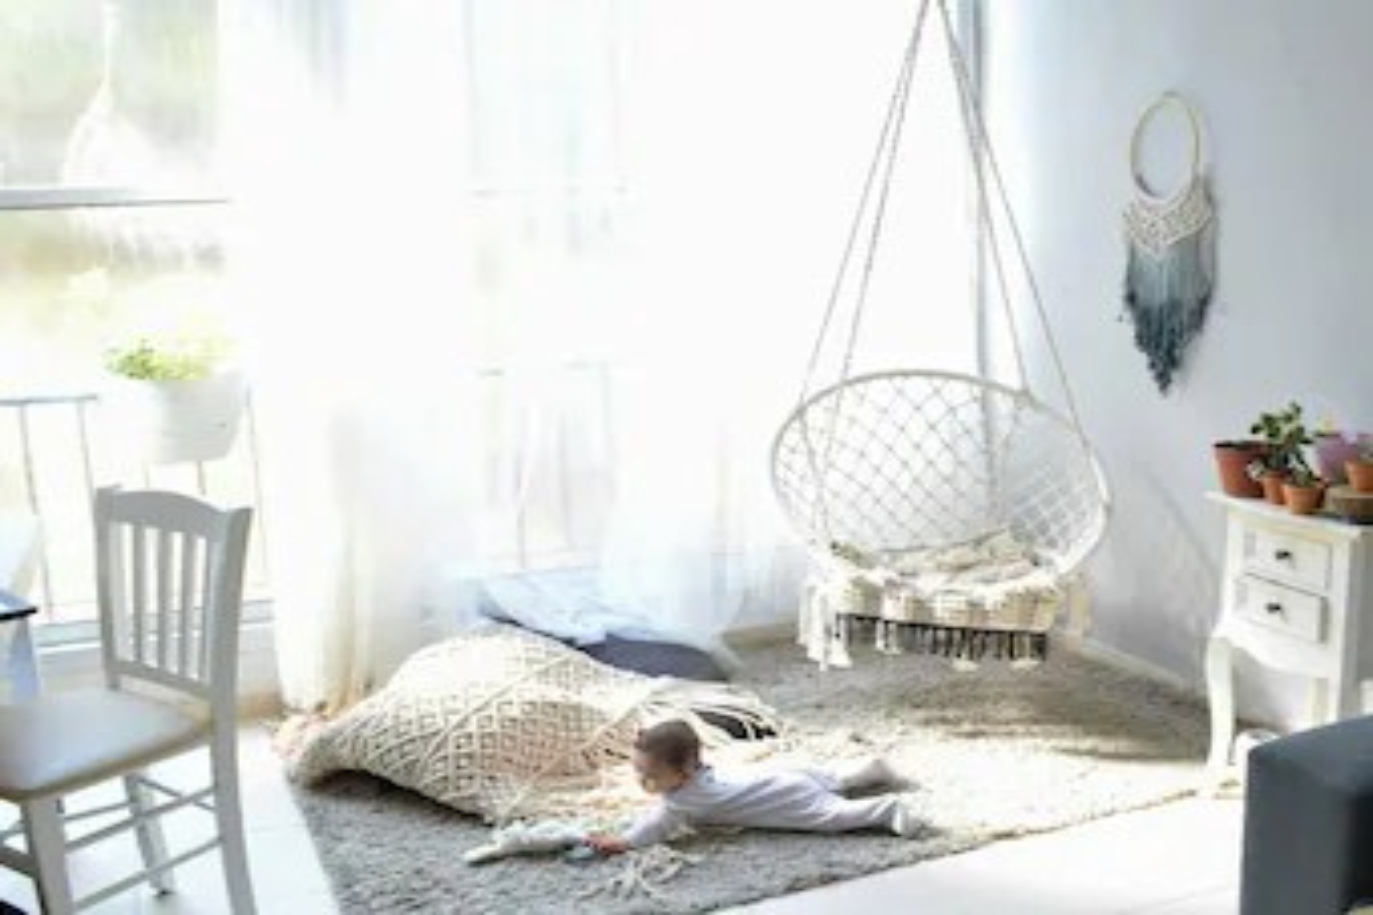 indoor hammock chair outdoor hanging chairs canada etsy macrame mcrame swing boho bohemian baby decor